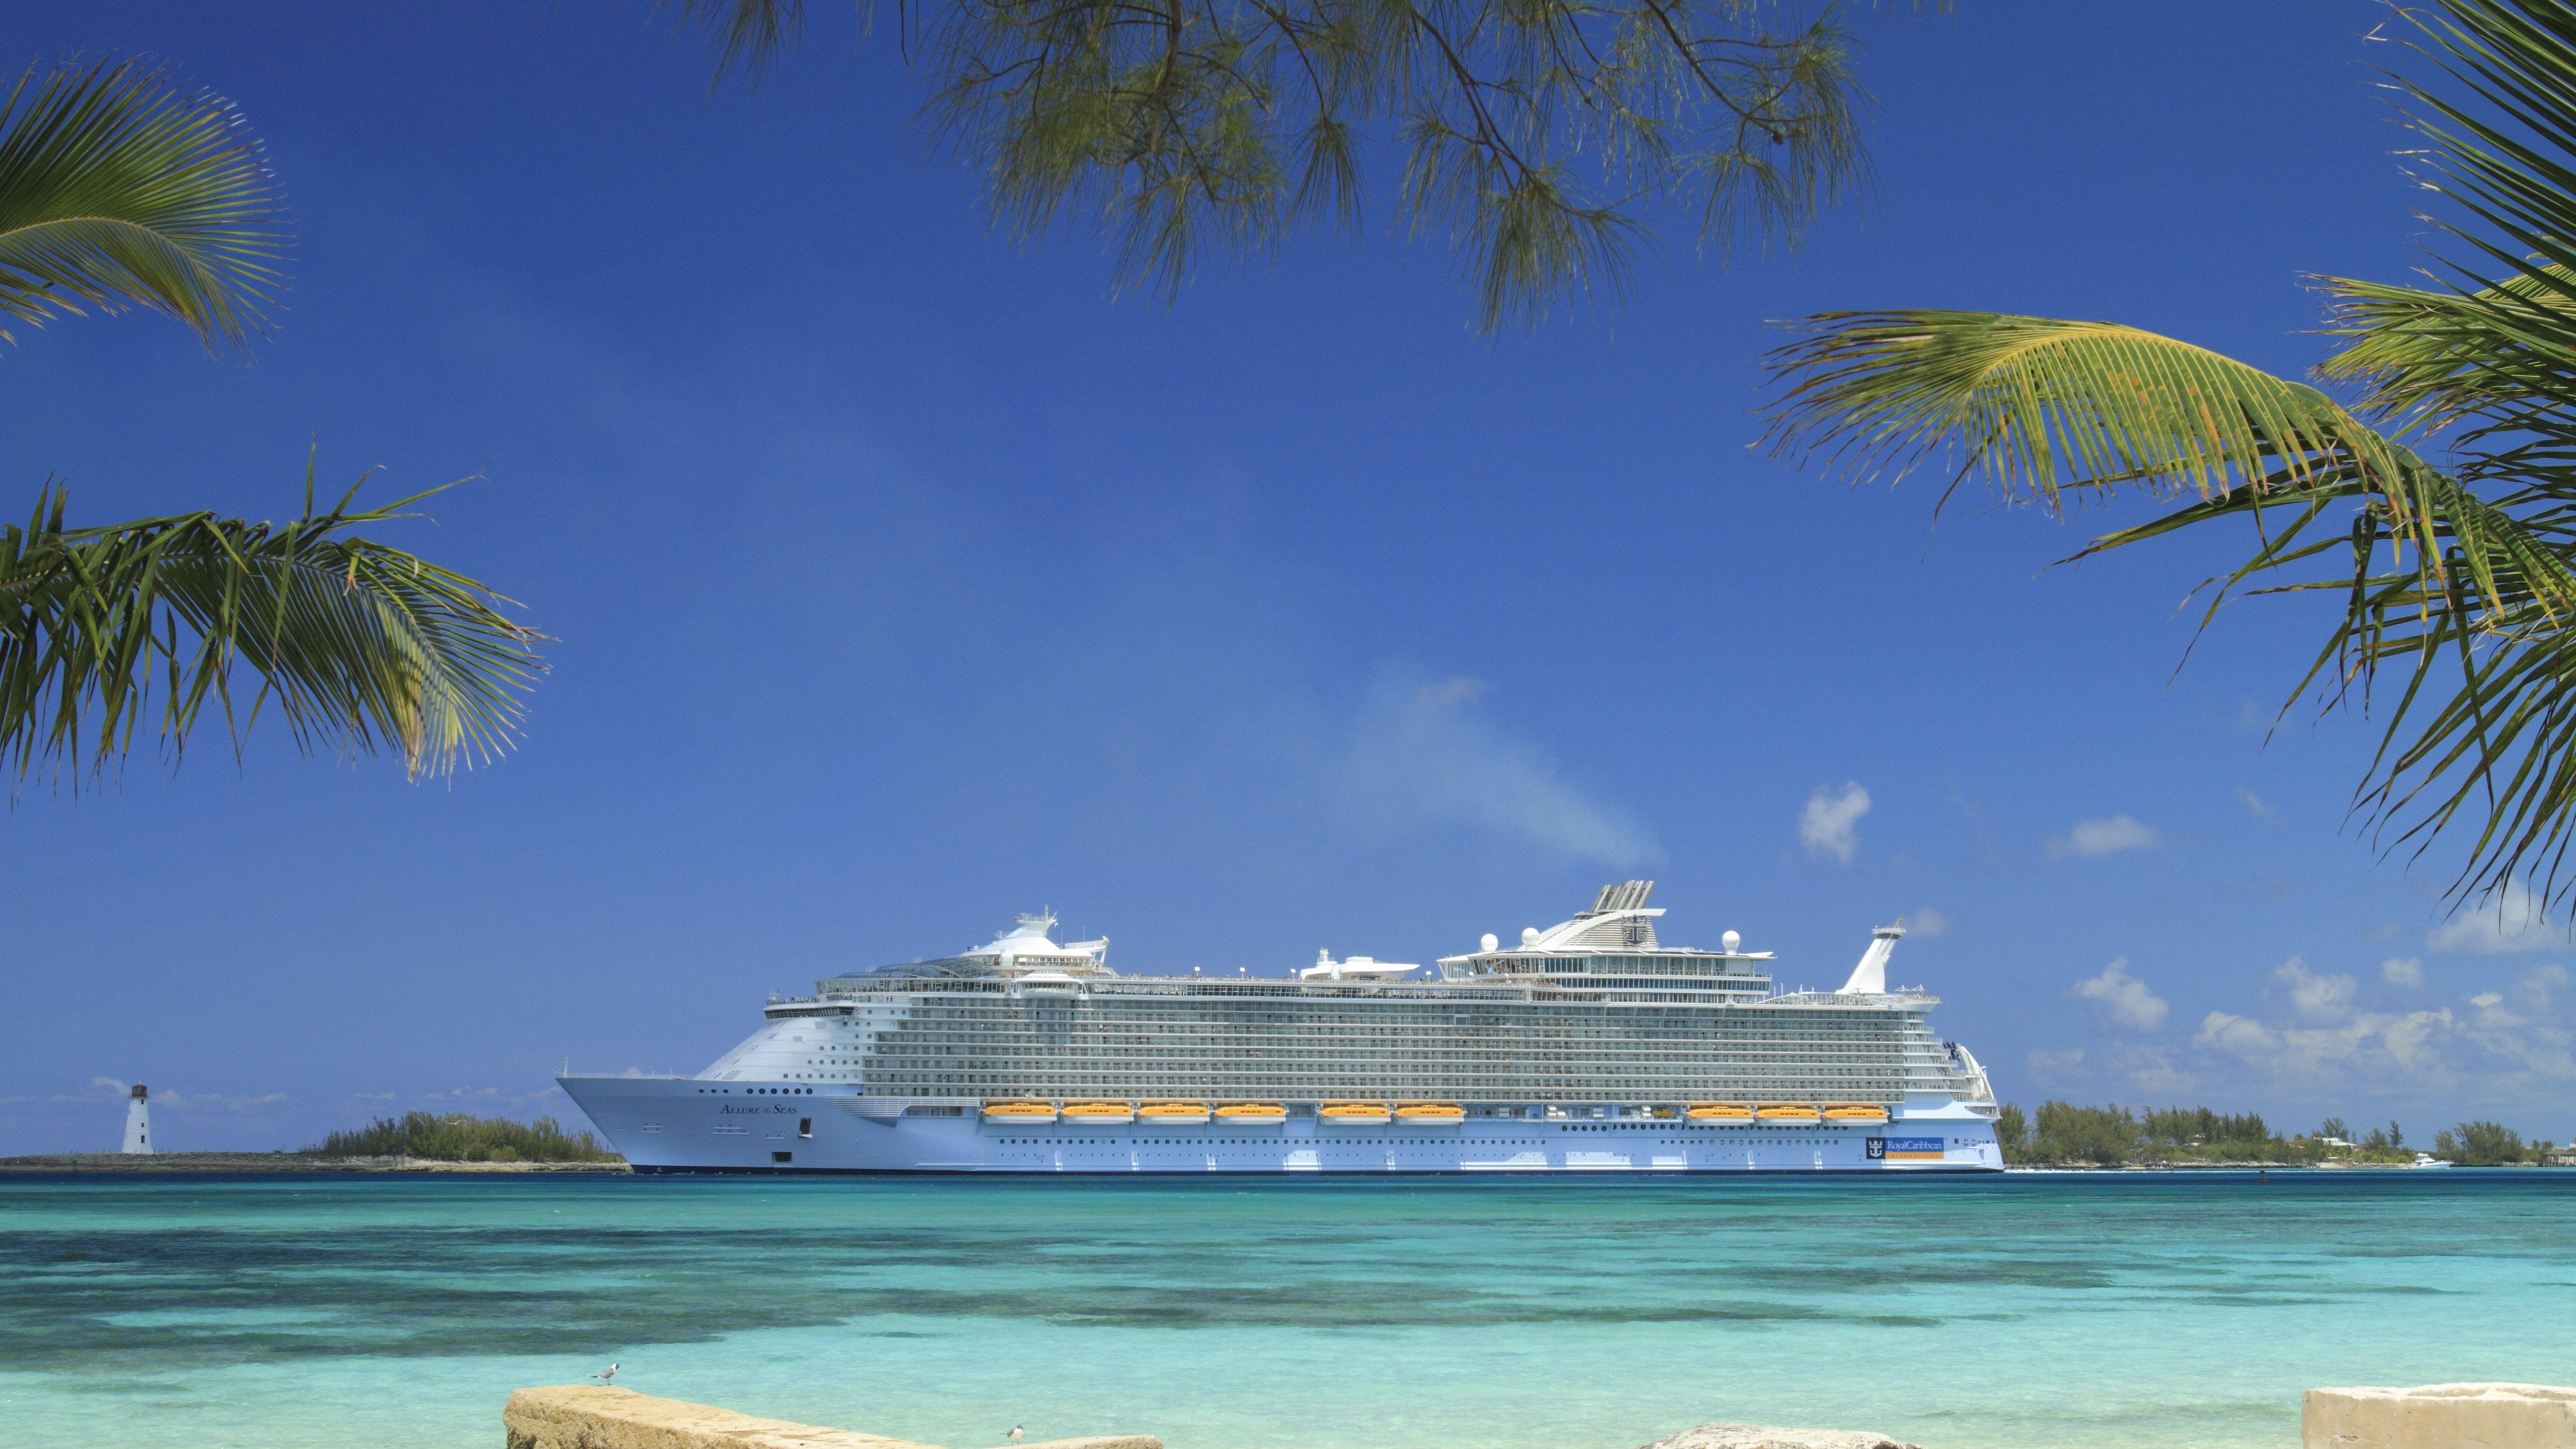 Allure of the Seas - Profile of Royal Caribbean Ship